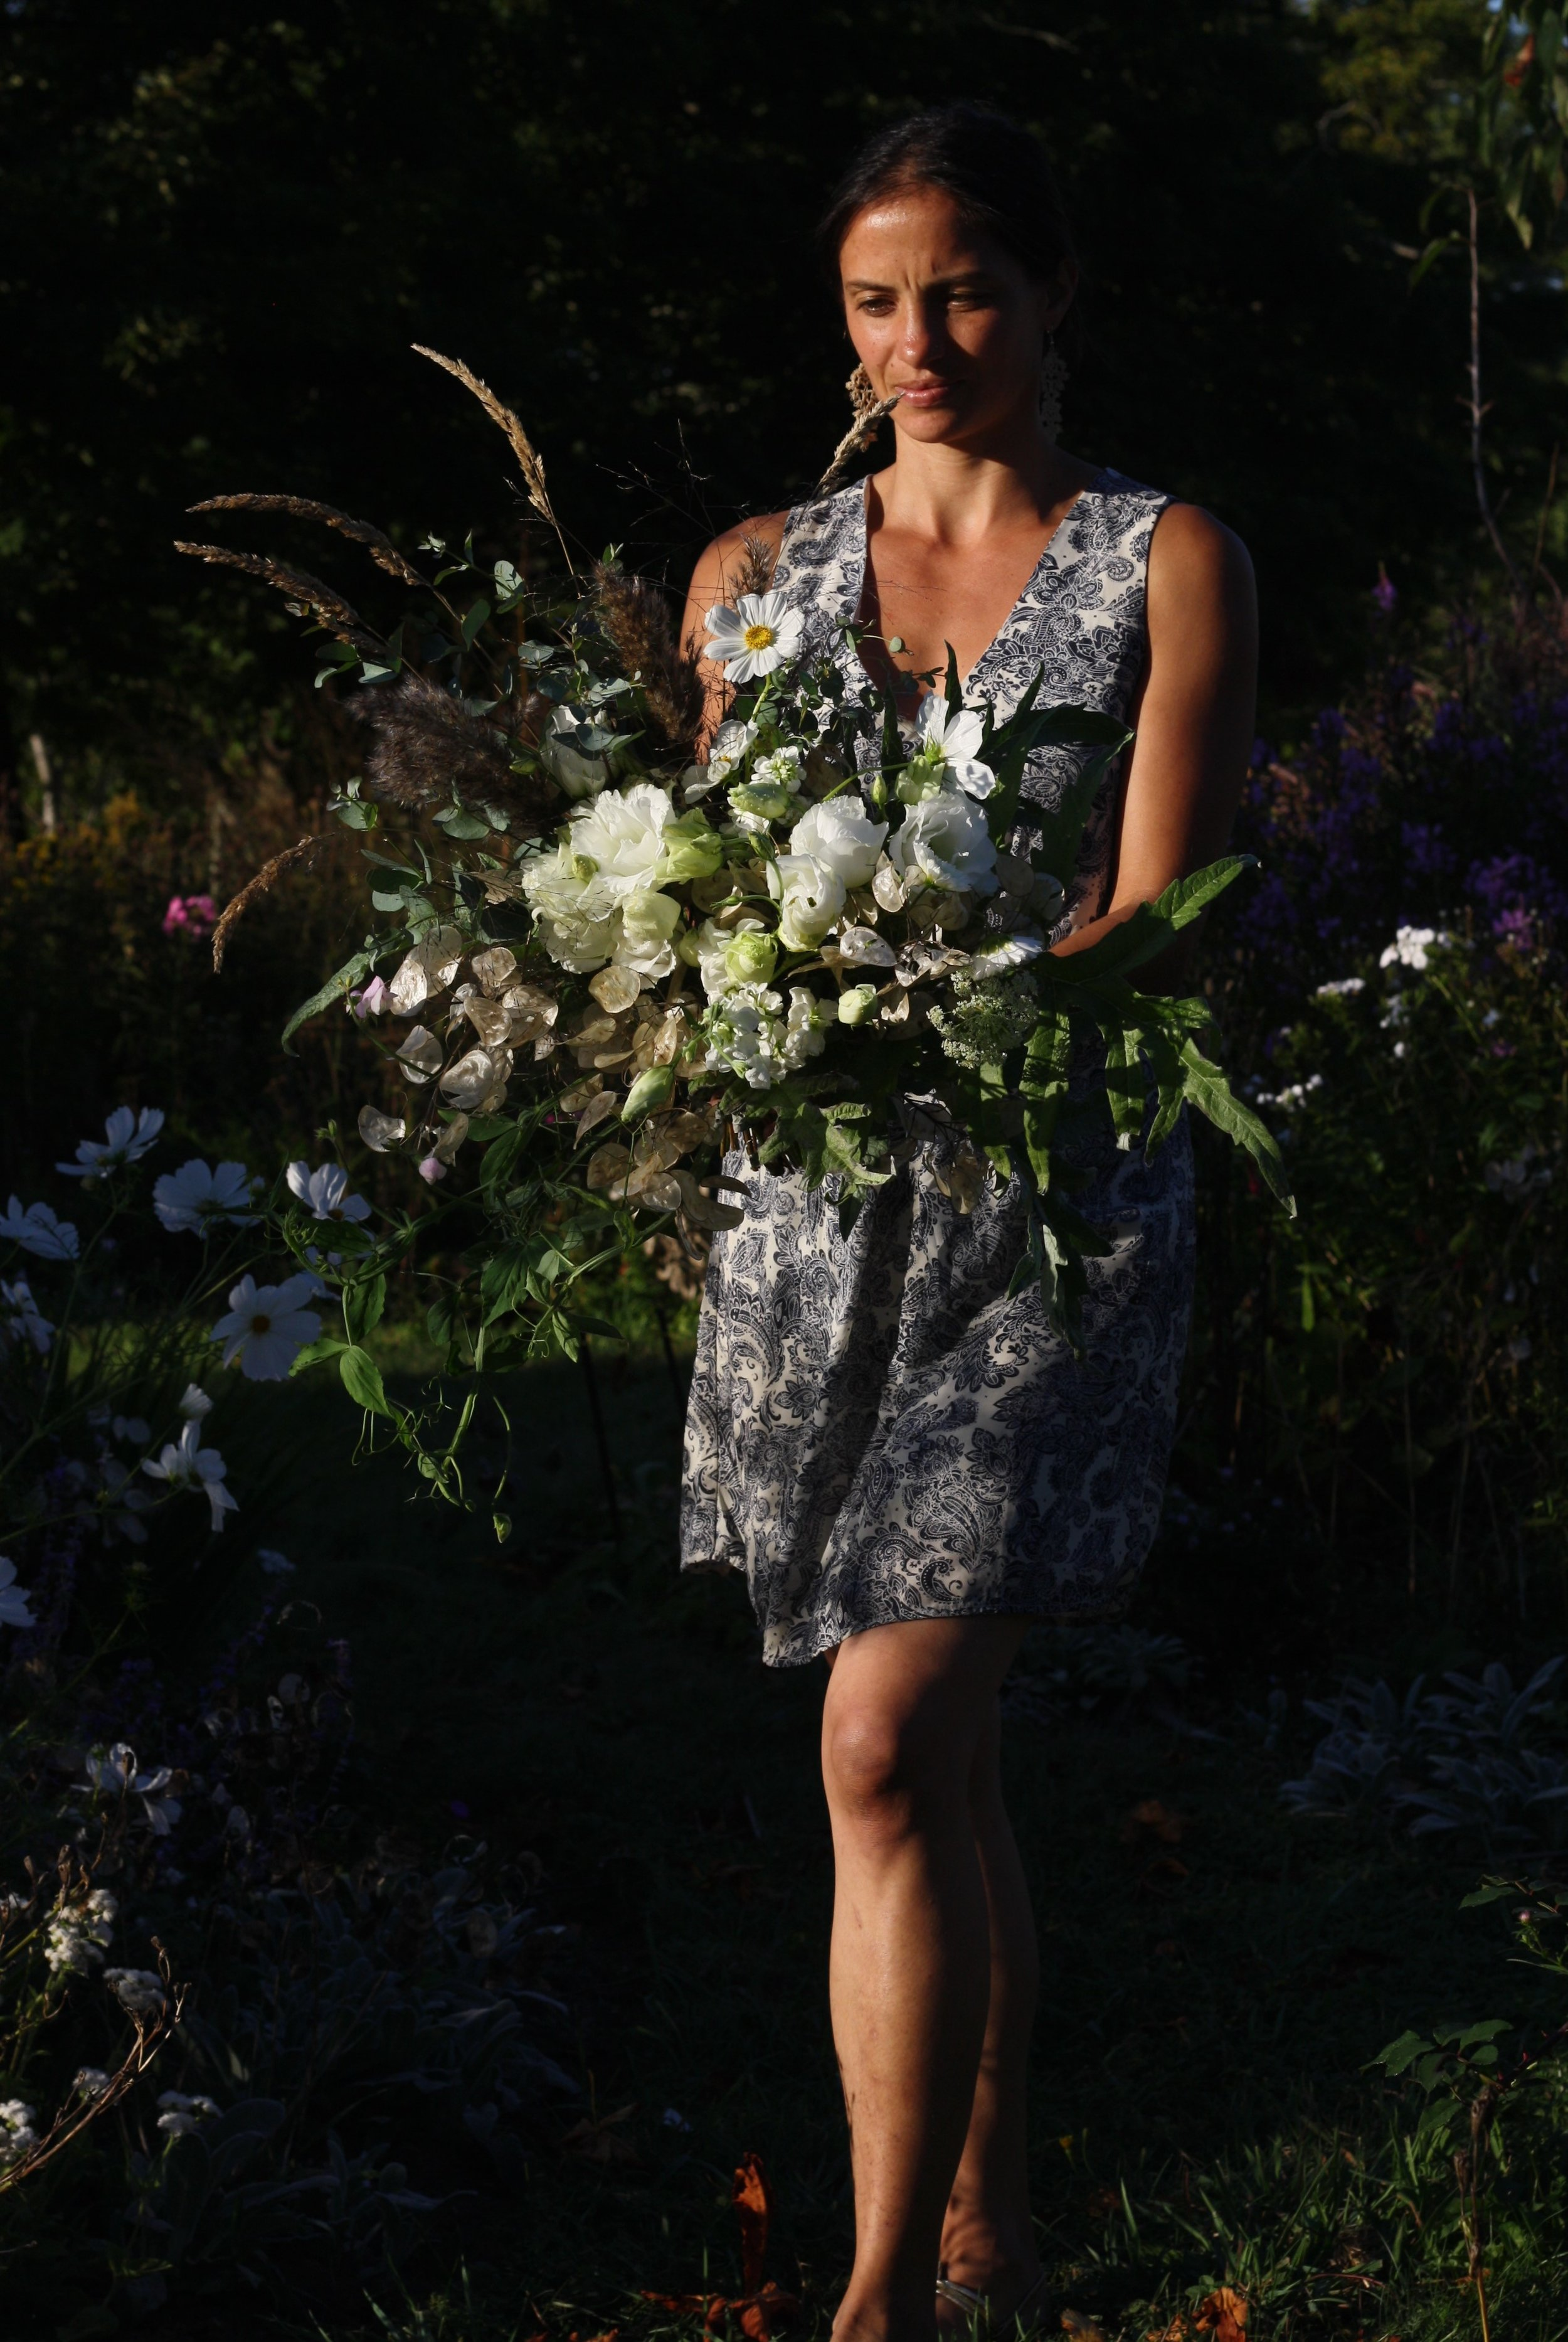 White wedding bouquet. Organically grown flowers in Nova Scotia. Hatfield Farm